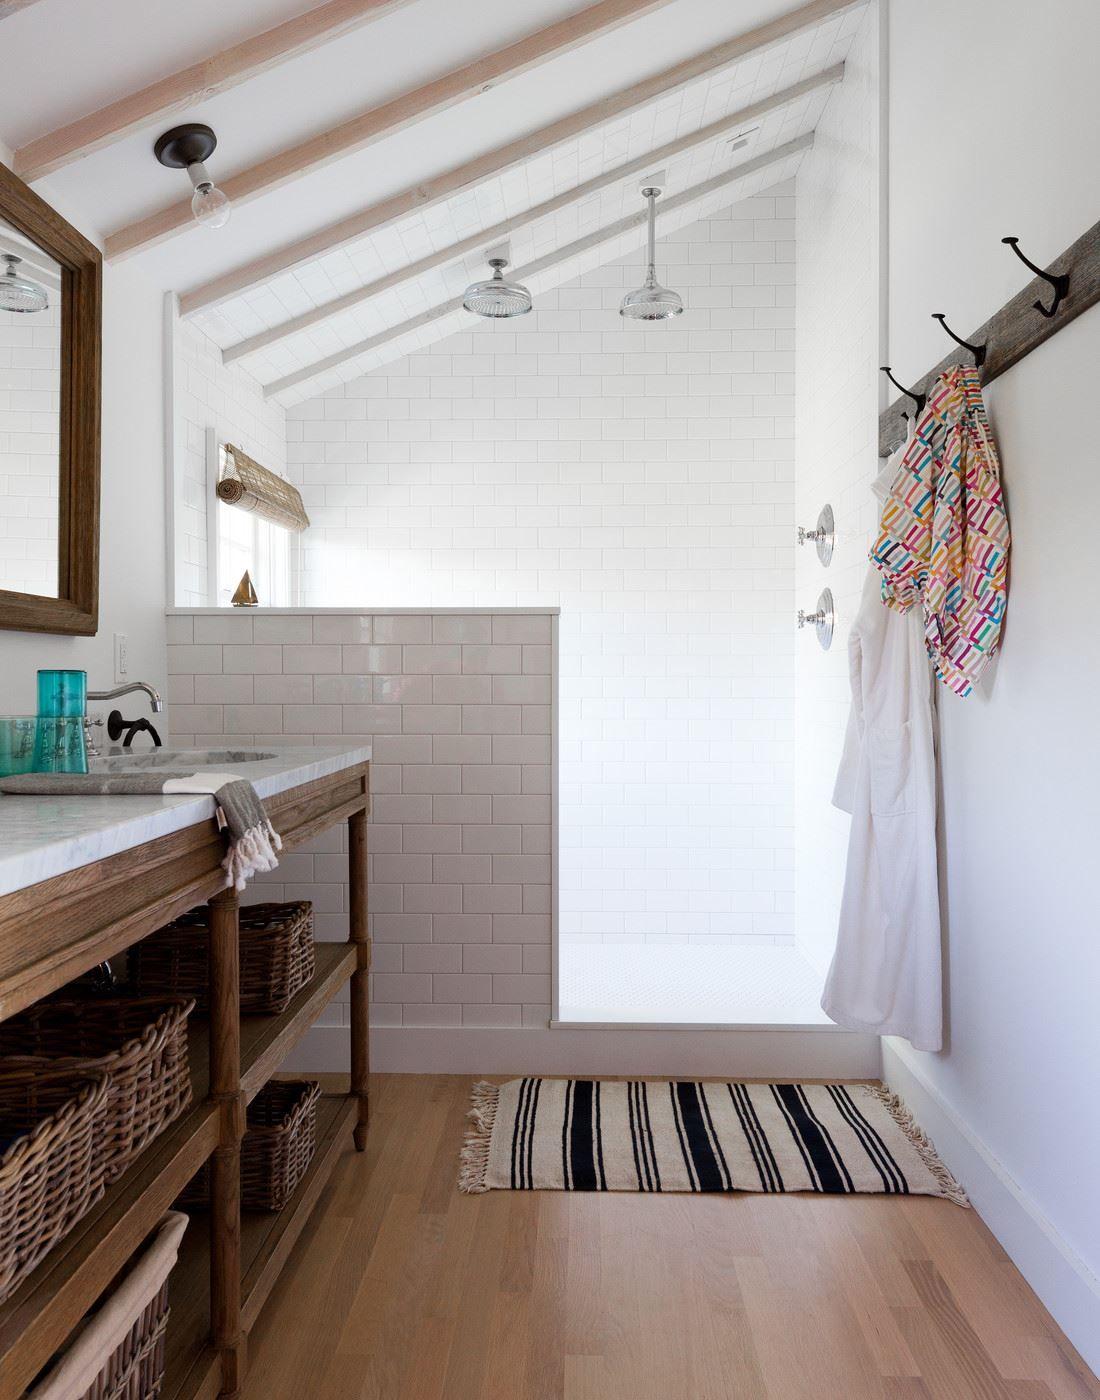 Cool Bathroom Storage Ideas Beach House Bathroom Attic Master Bedroom Bathroom Inspiration